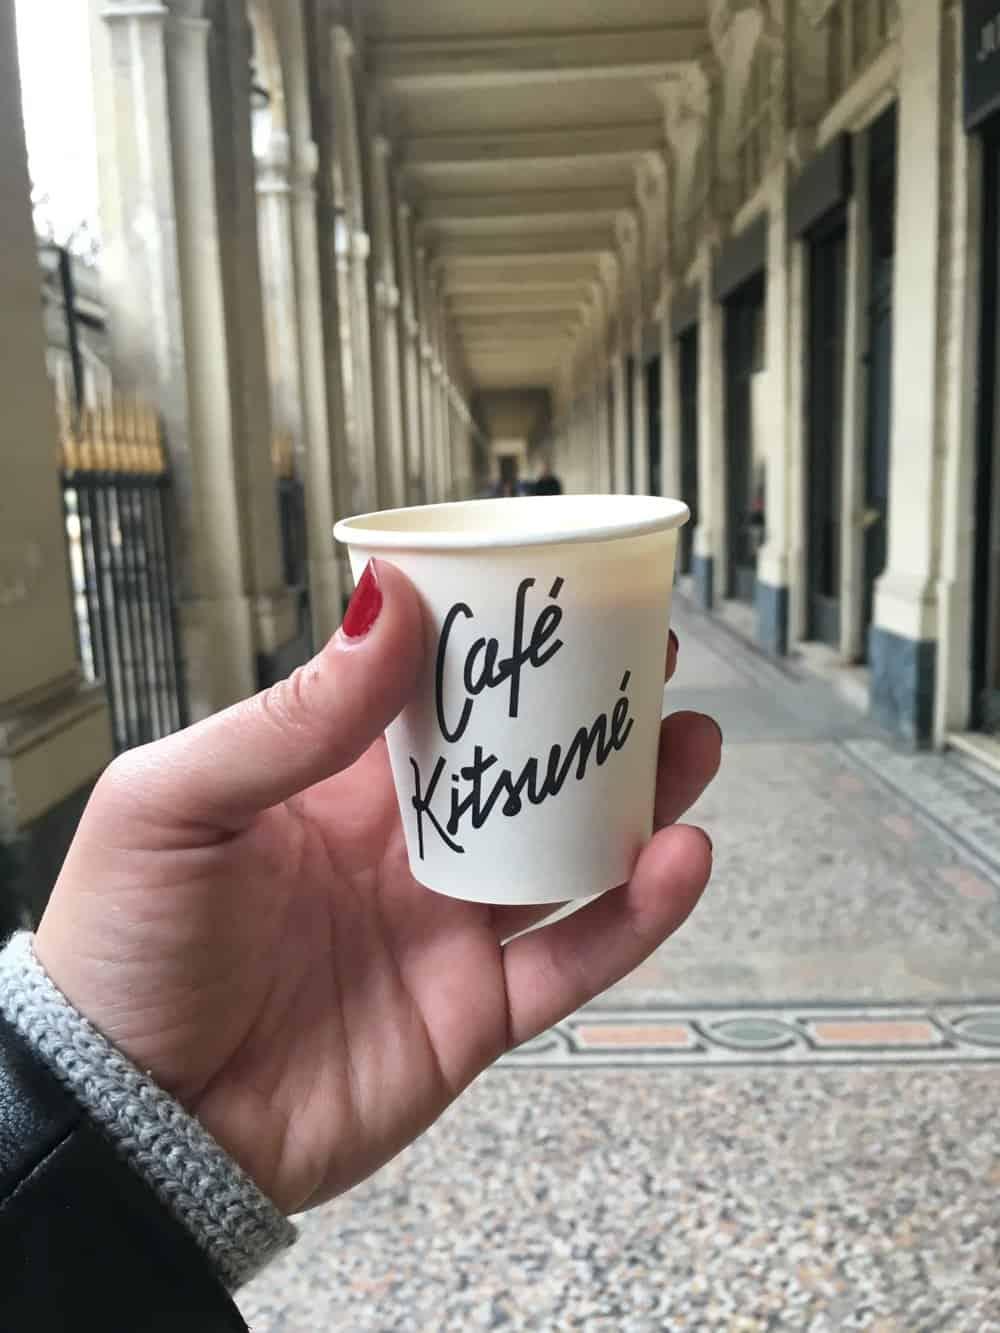 Cafe Kitsune in Palais Royal